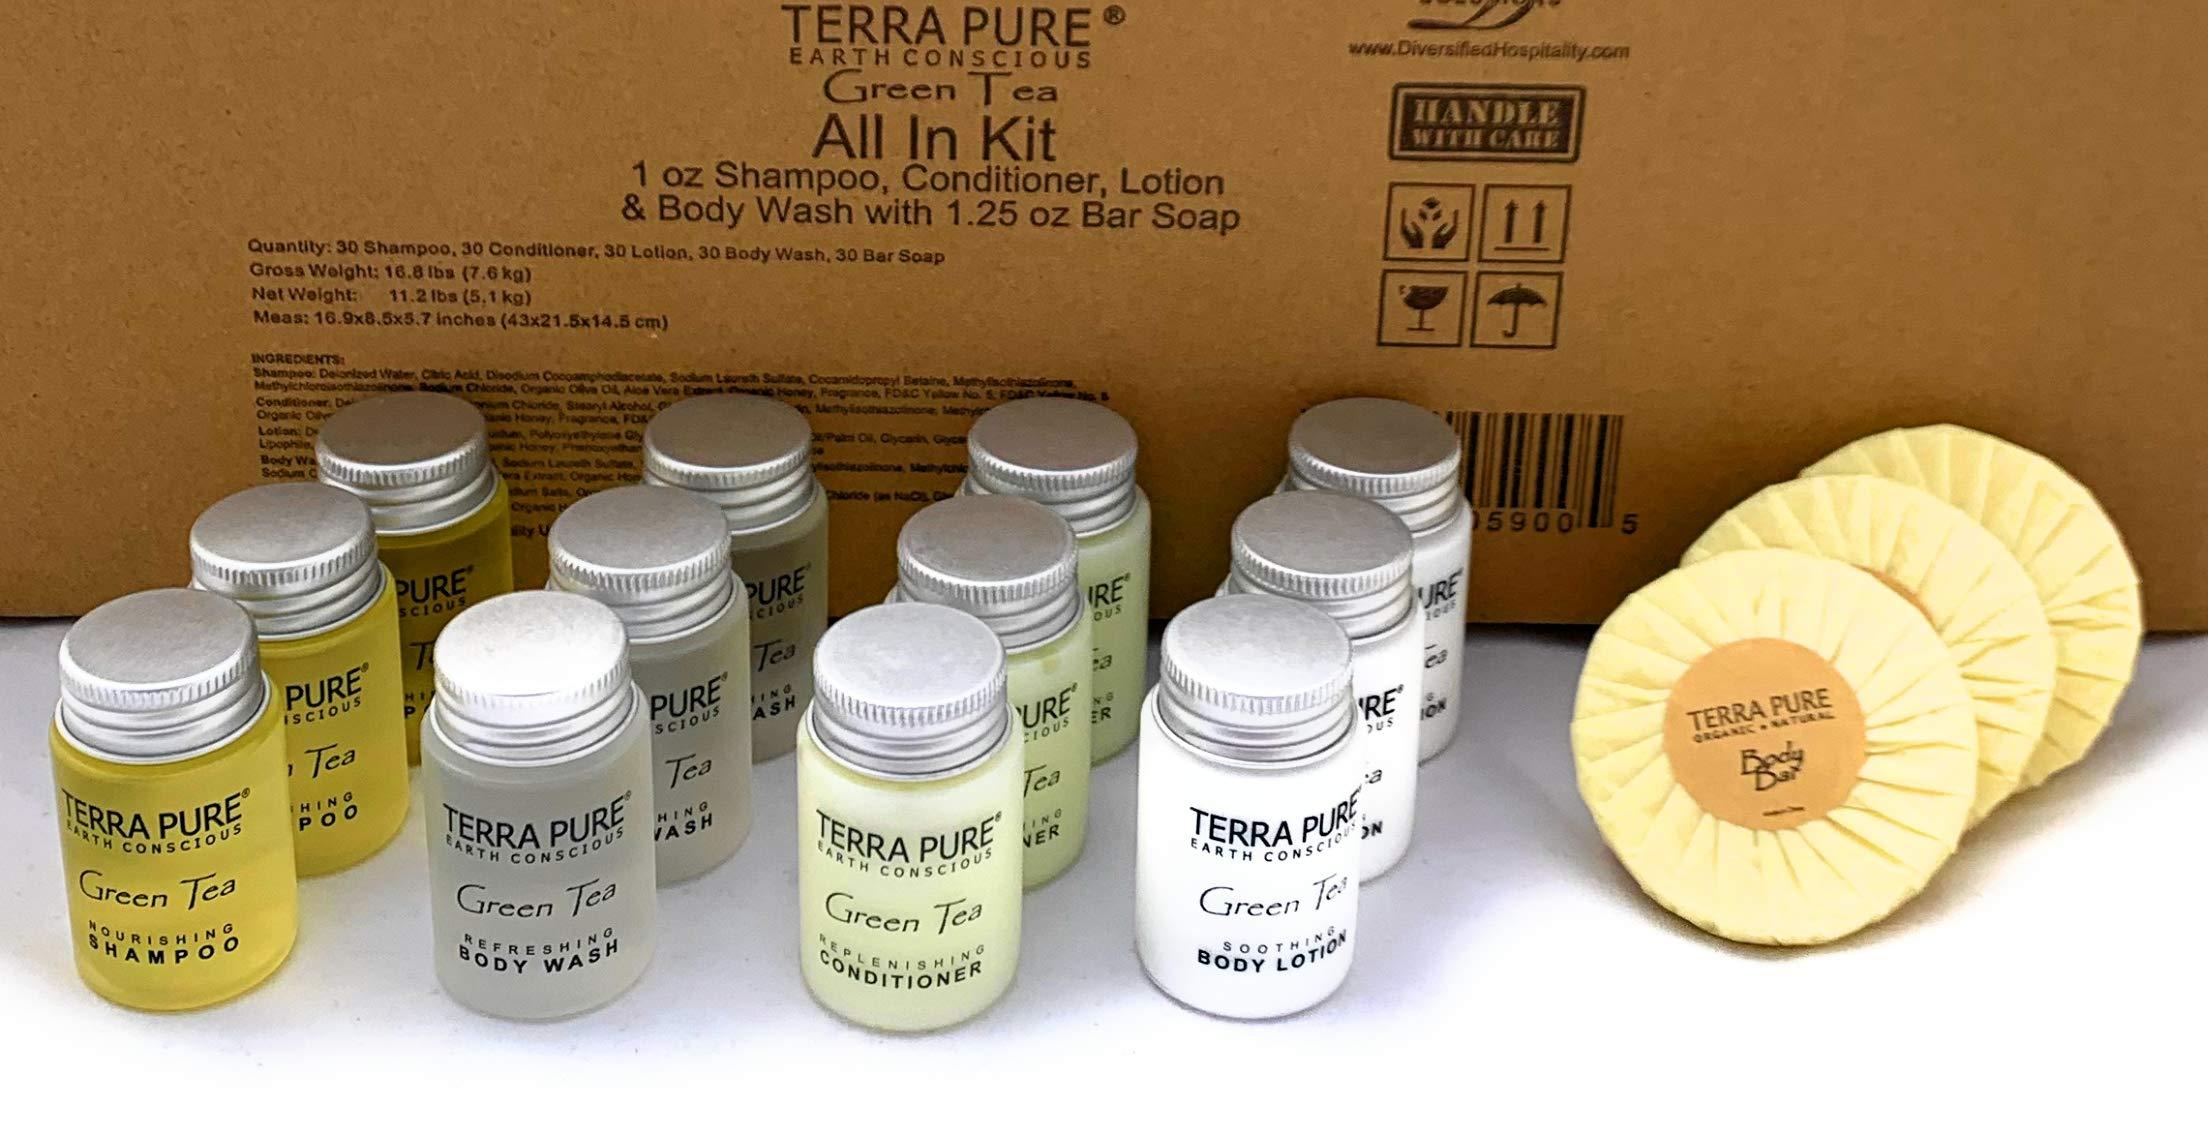 Terra Pure Green Tea All-In-Kit Hotel/Vacation Rental Amenities Set (300 pcs)